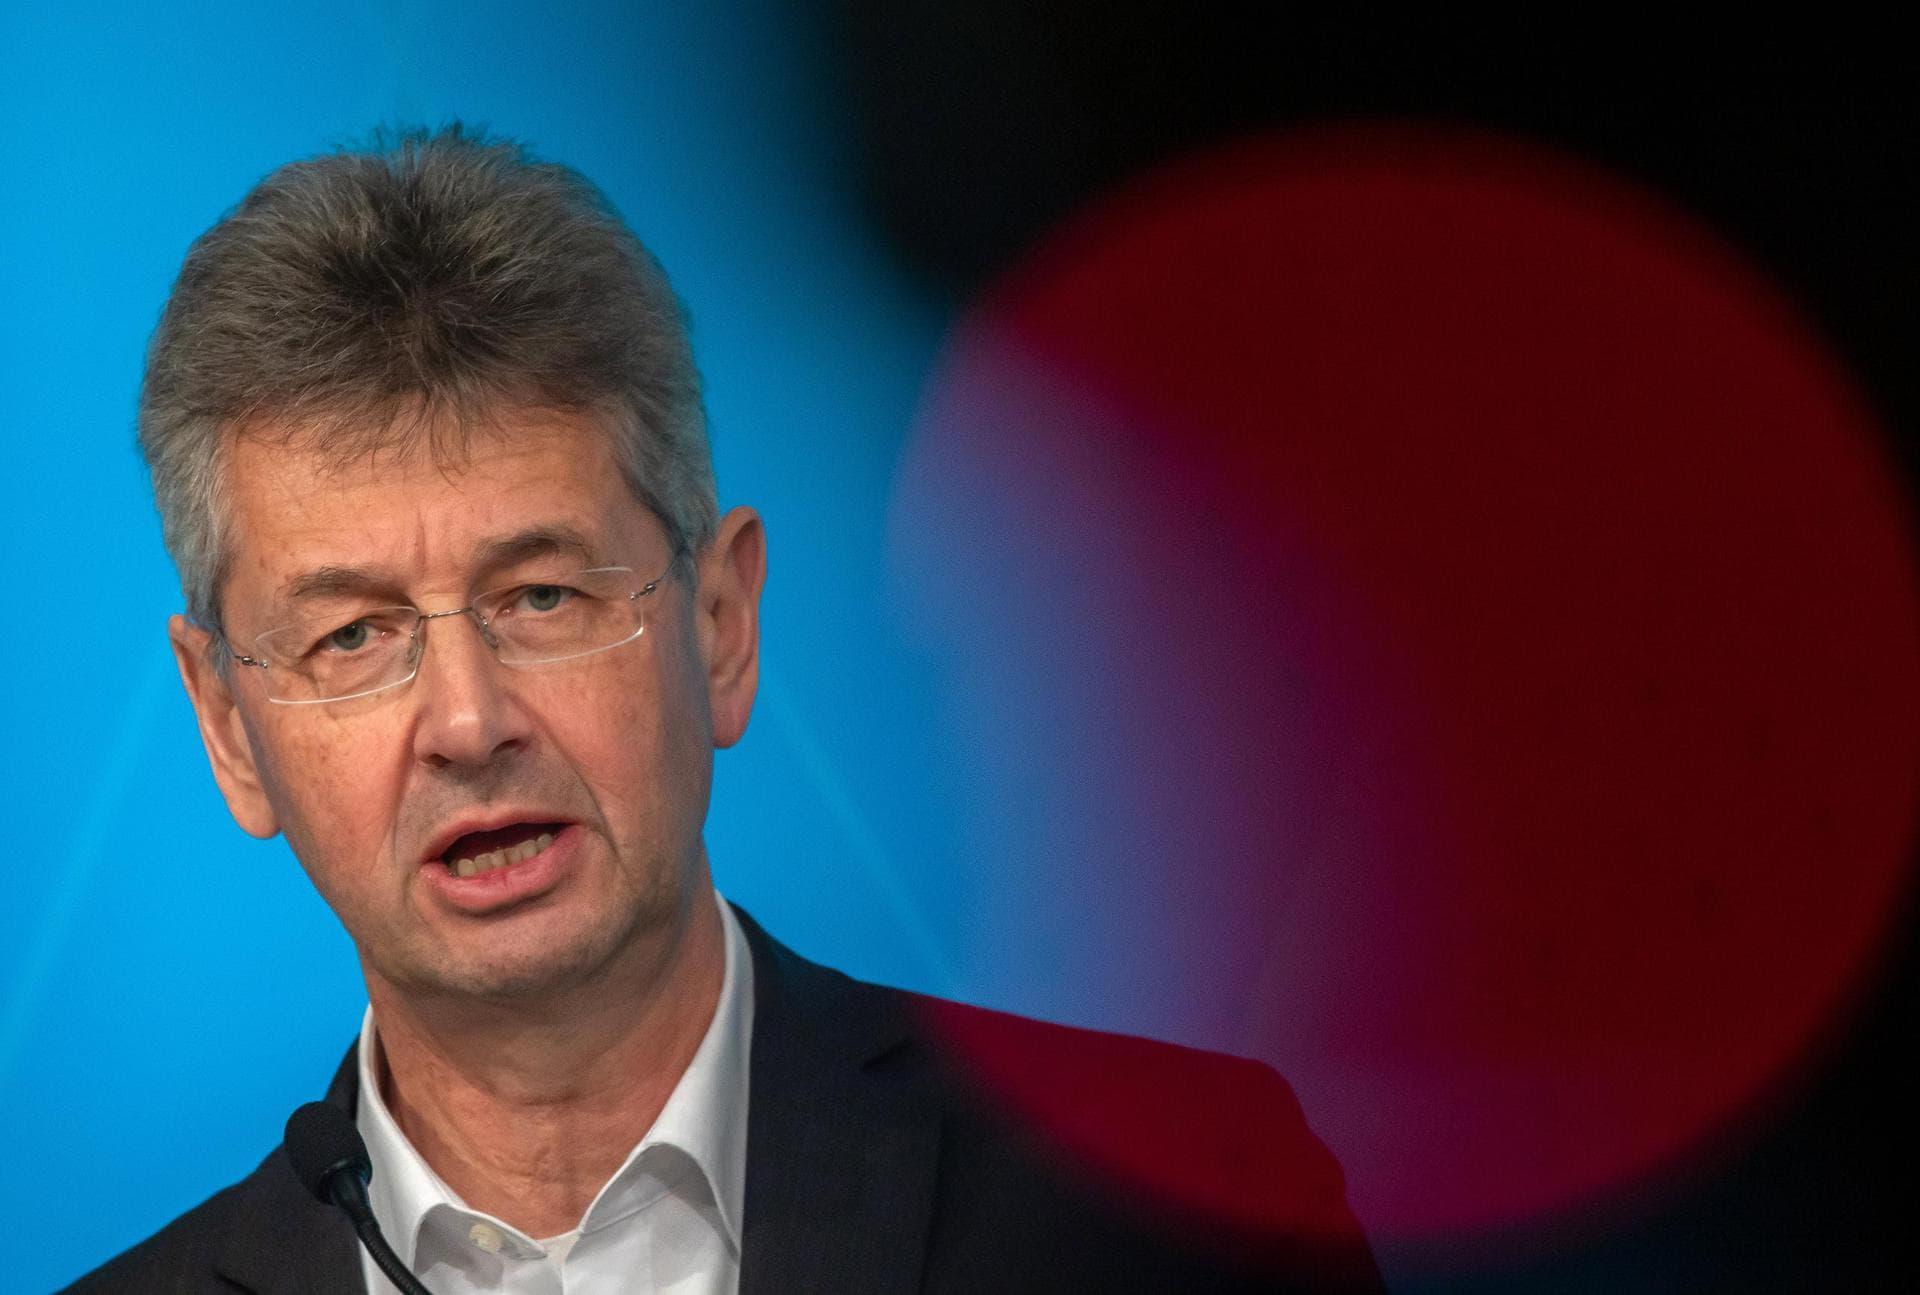 Bayern verschiebt alle Schulabschlussprüfungen Wegen Corona